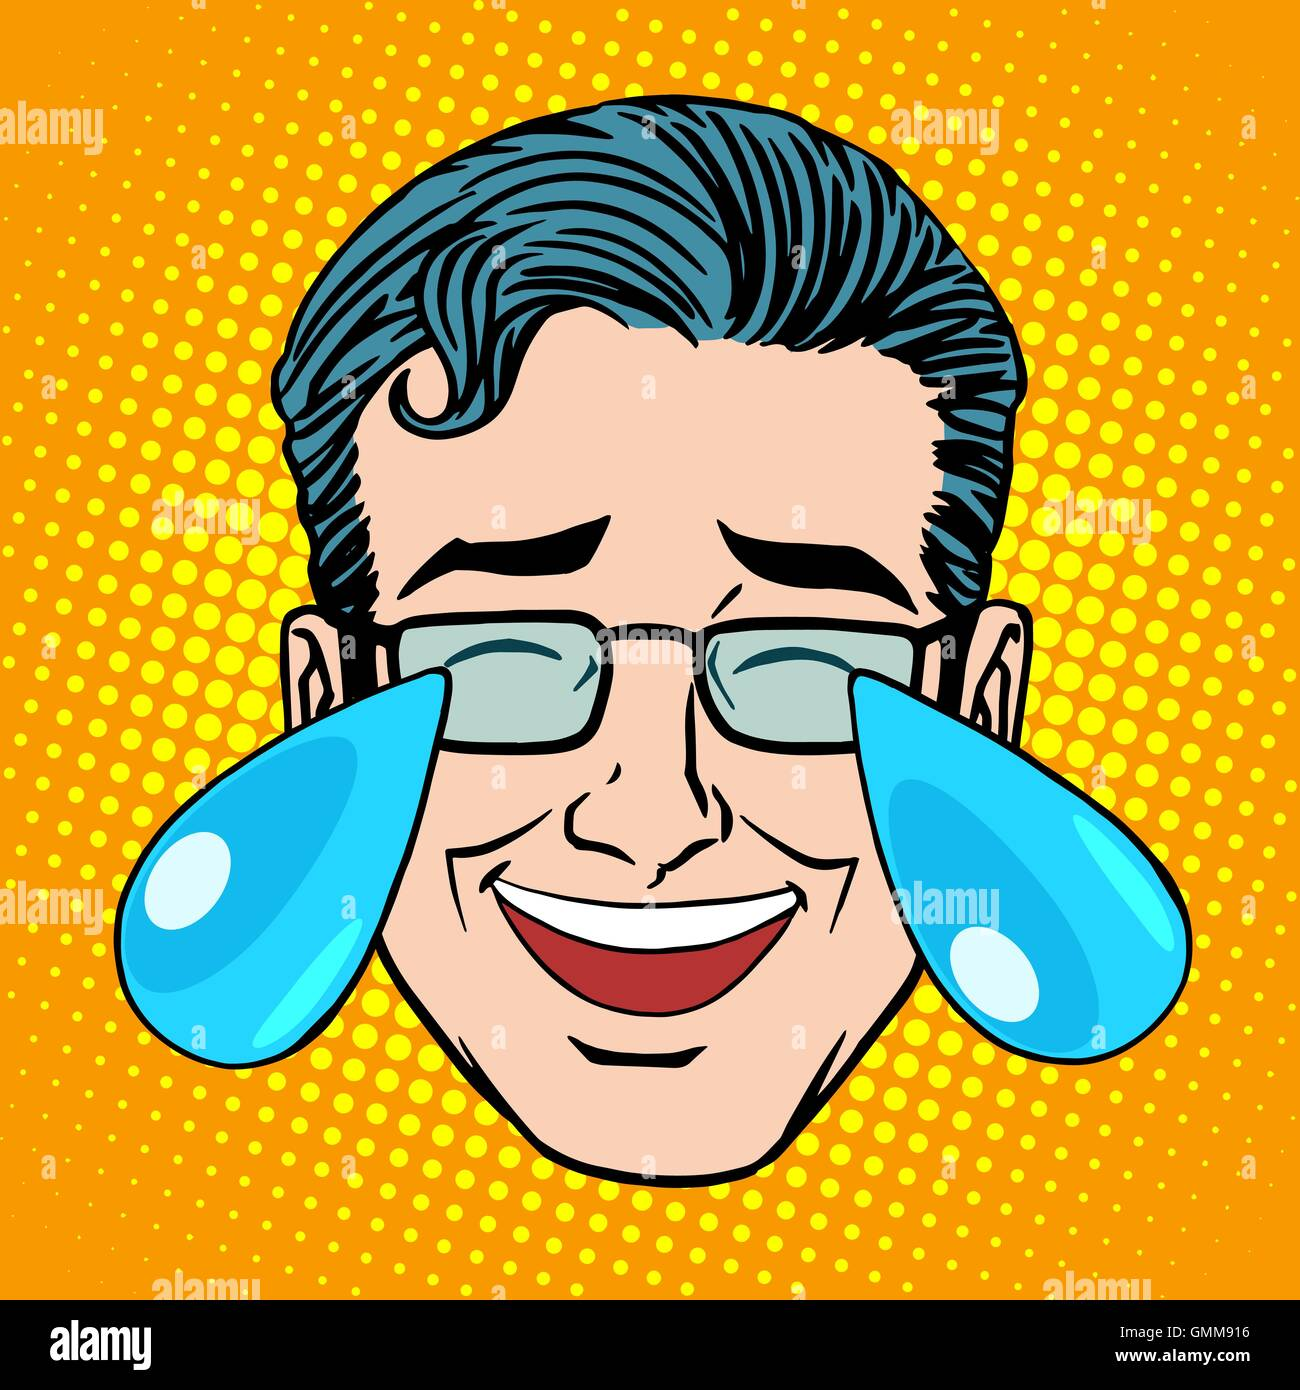 Retro Emoji tears joy man face - Stock Image